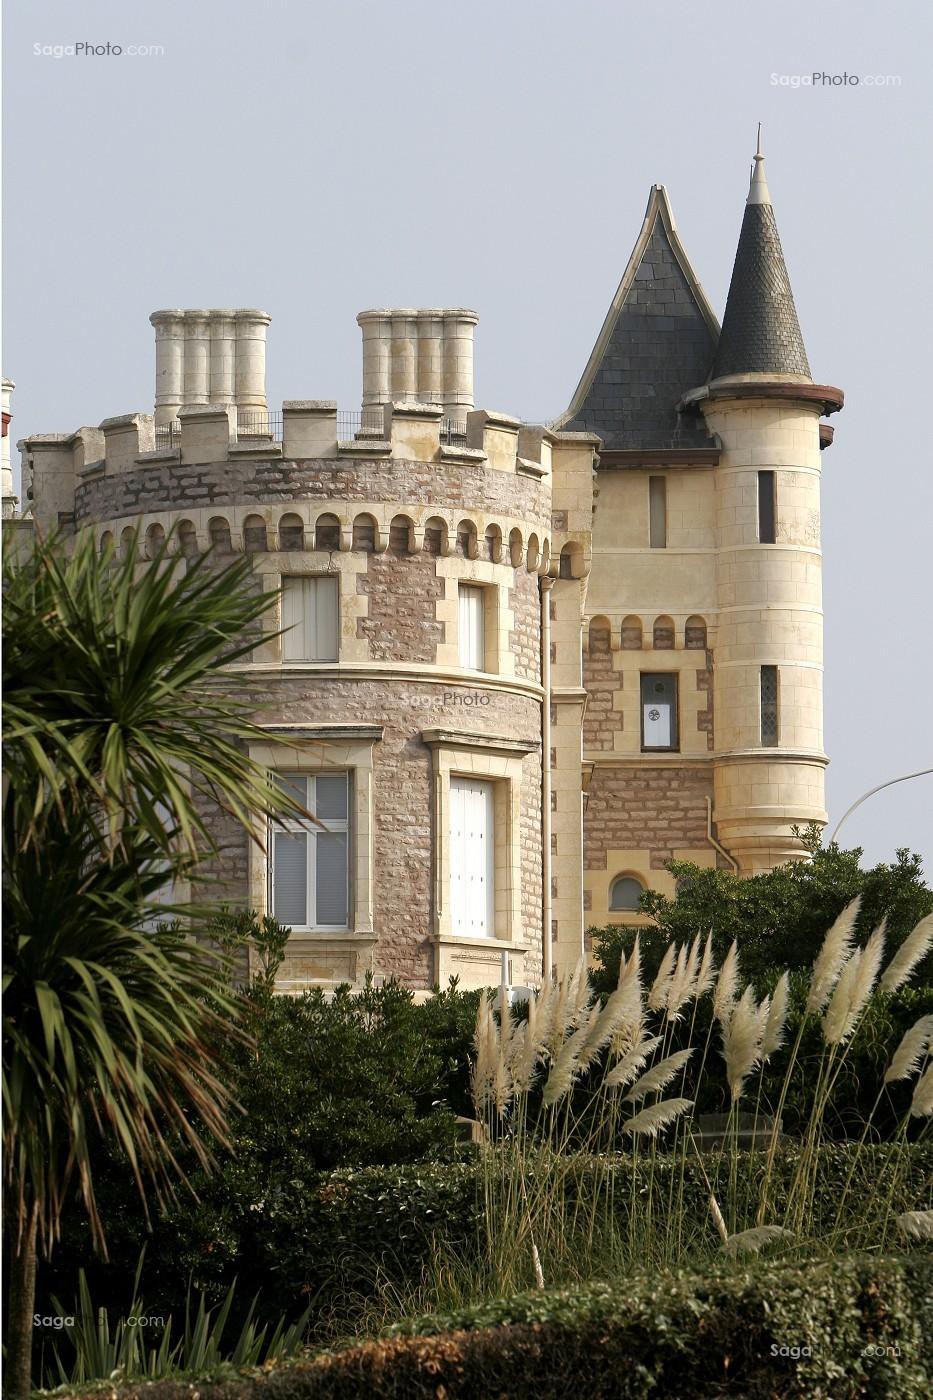 photo de villa roche ronde architecte huguenin pays basque cote basque biarritz biarritz. Black Bedroom Furniture Sets. Home Design Ideas